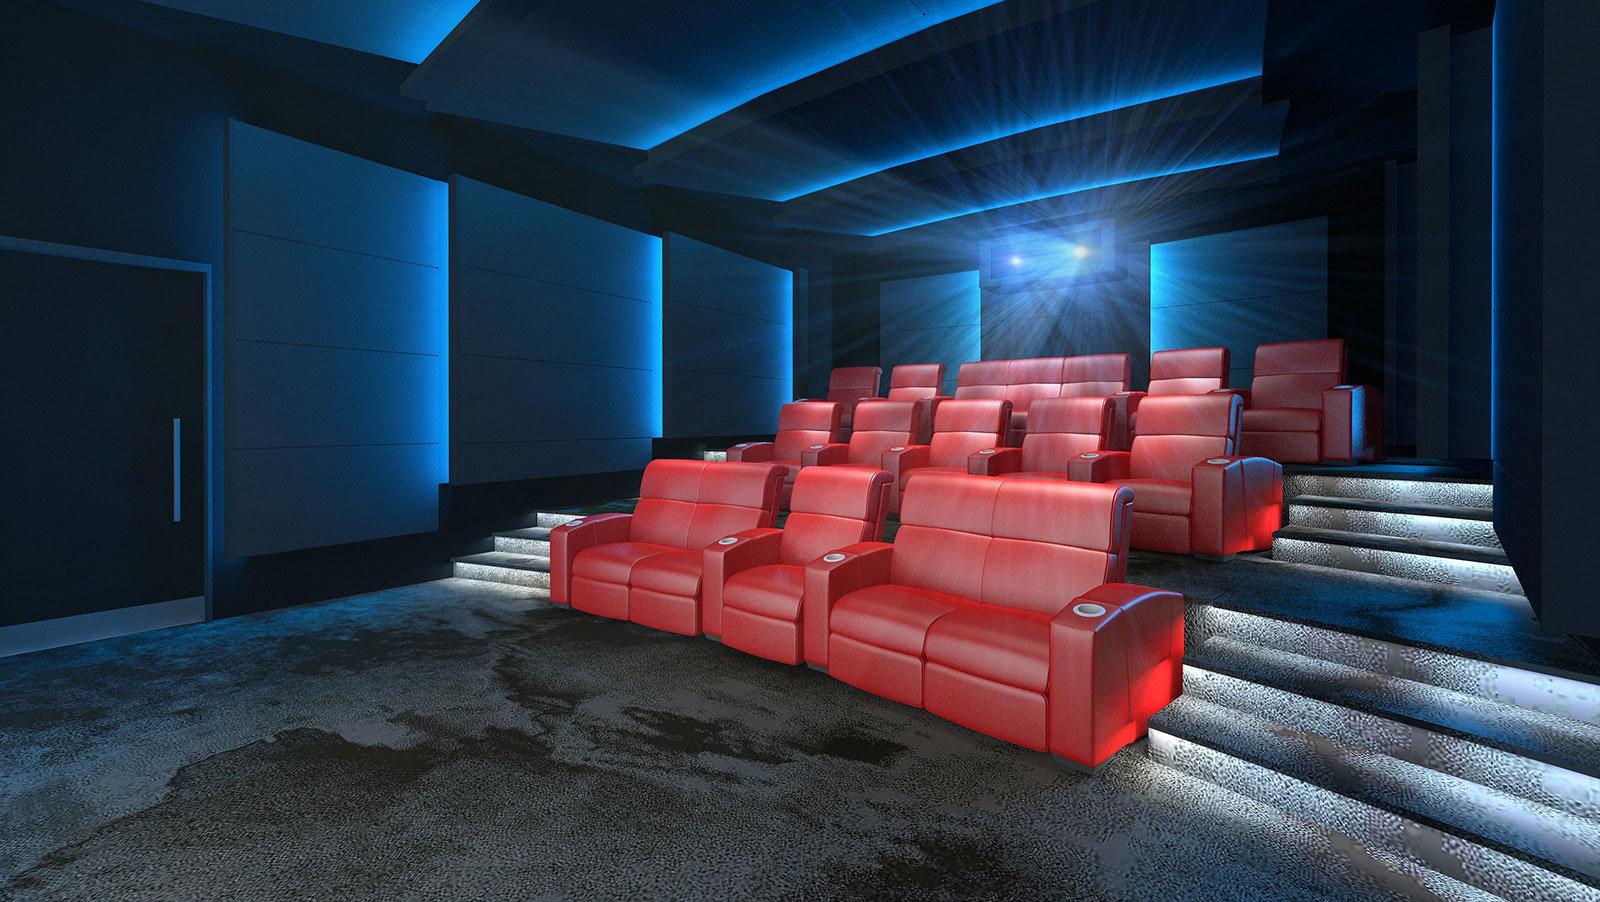 IMAX Privat Theatre Palais